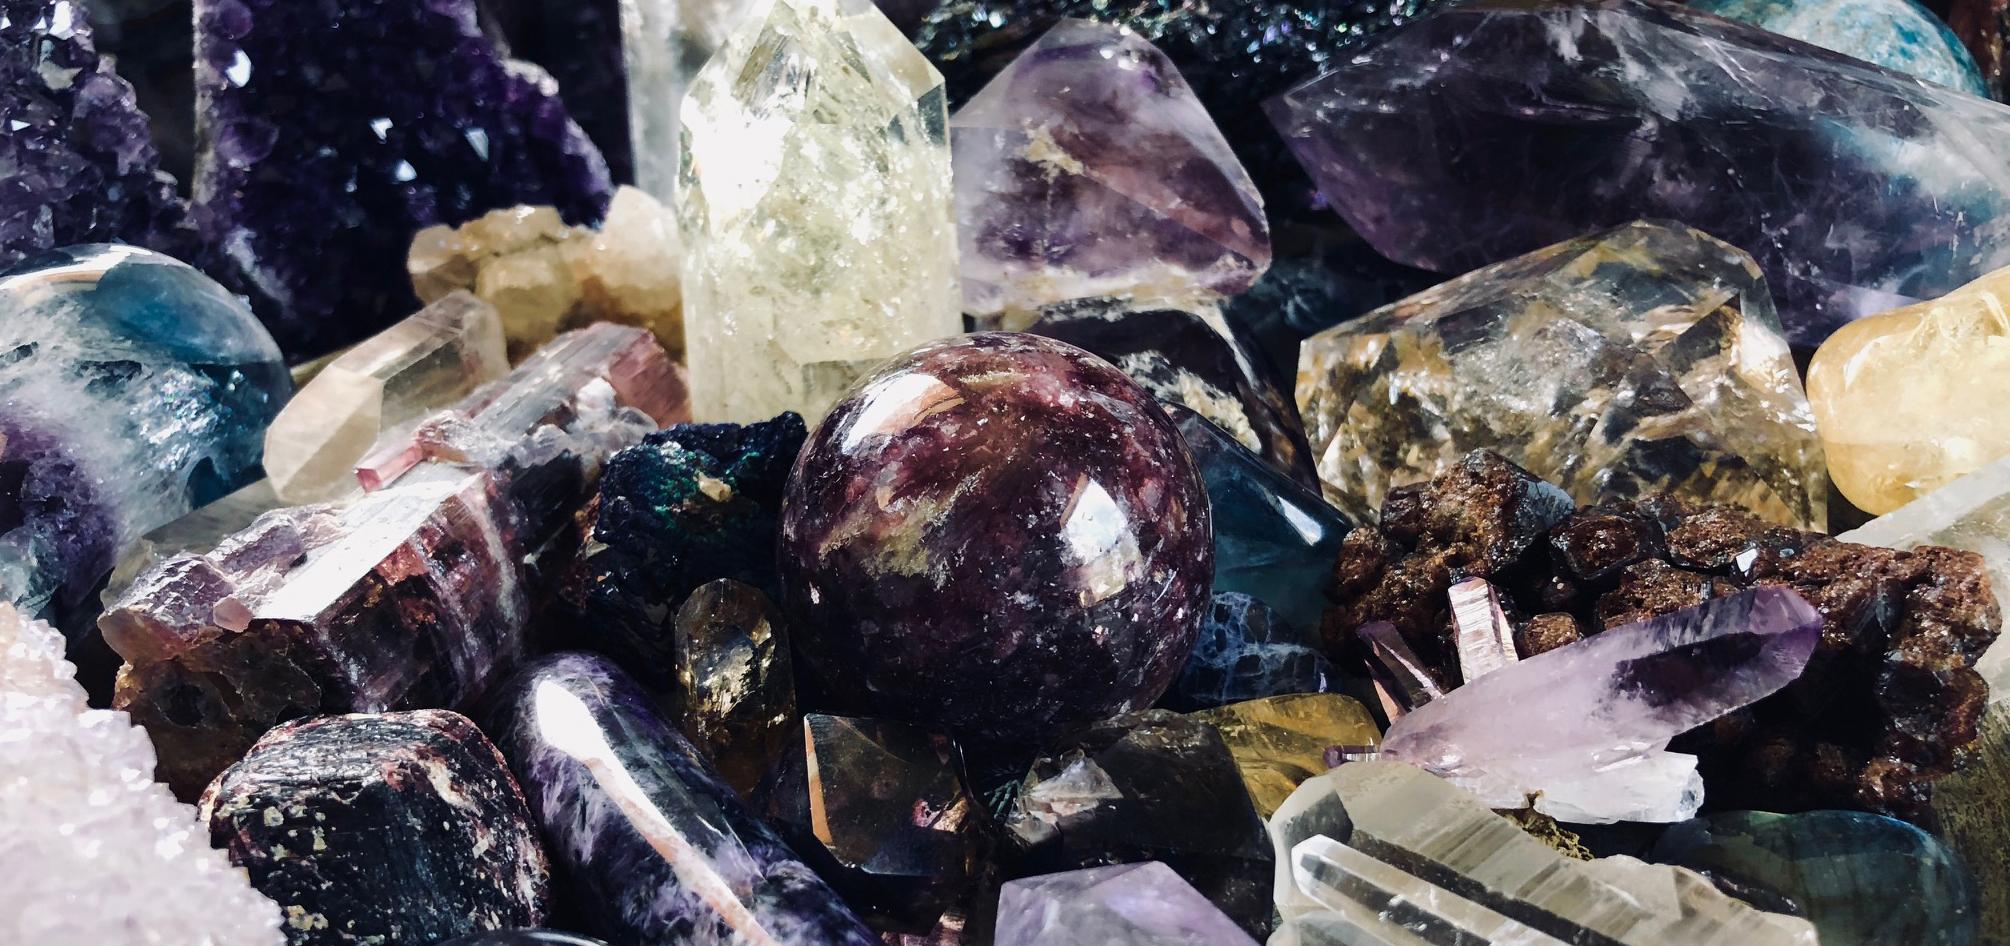 gem-show-crystals-white-magic.jpg